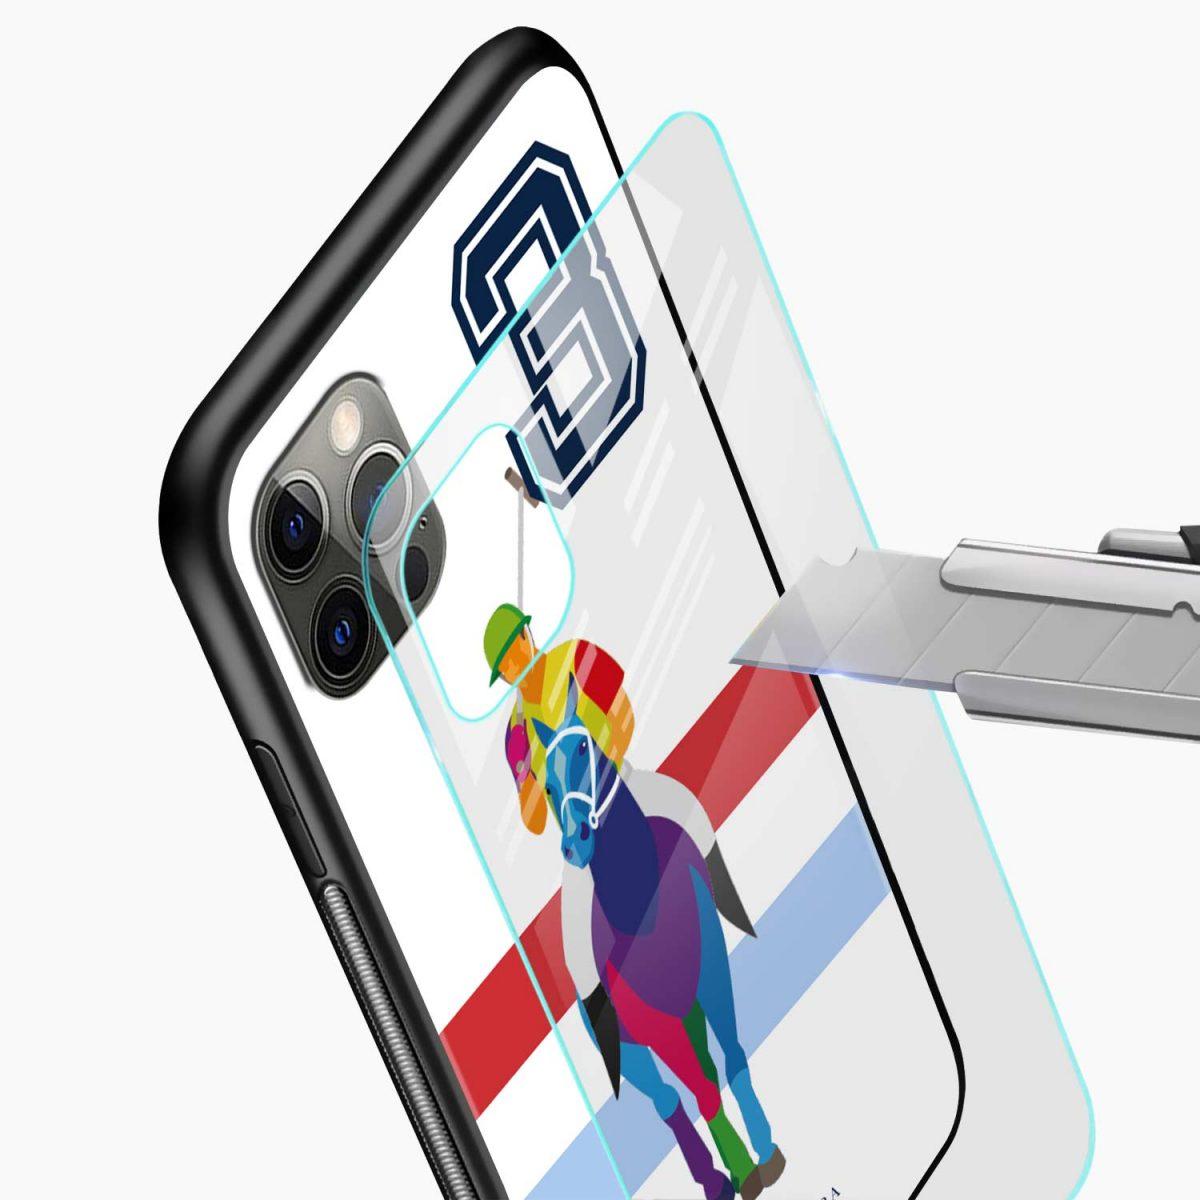 multicolor sant barbara polo iphone pro back cover glass view